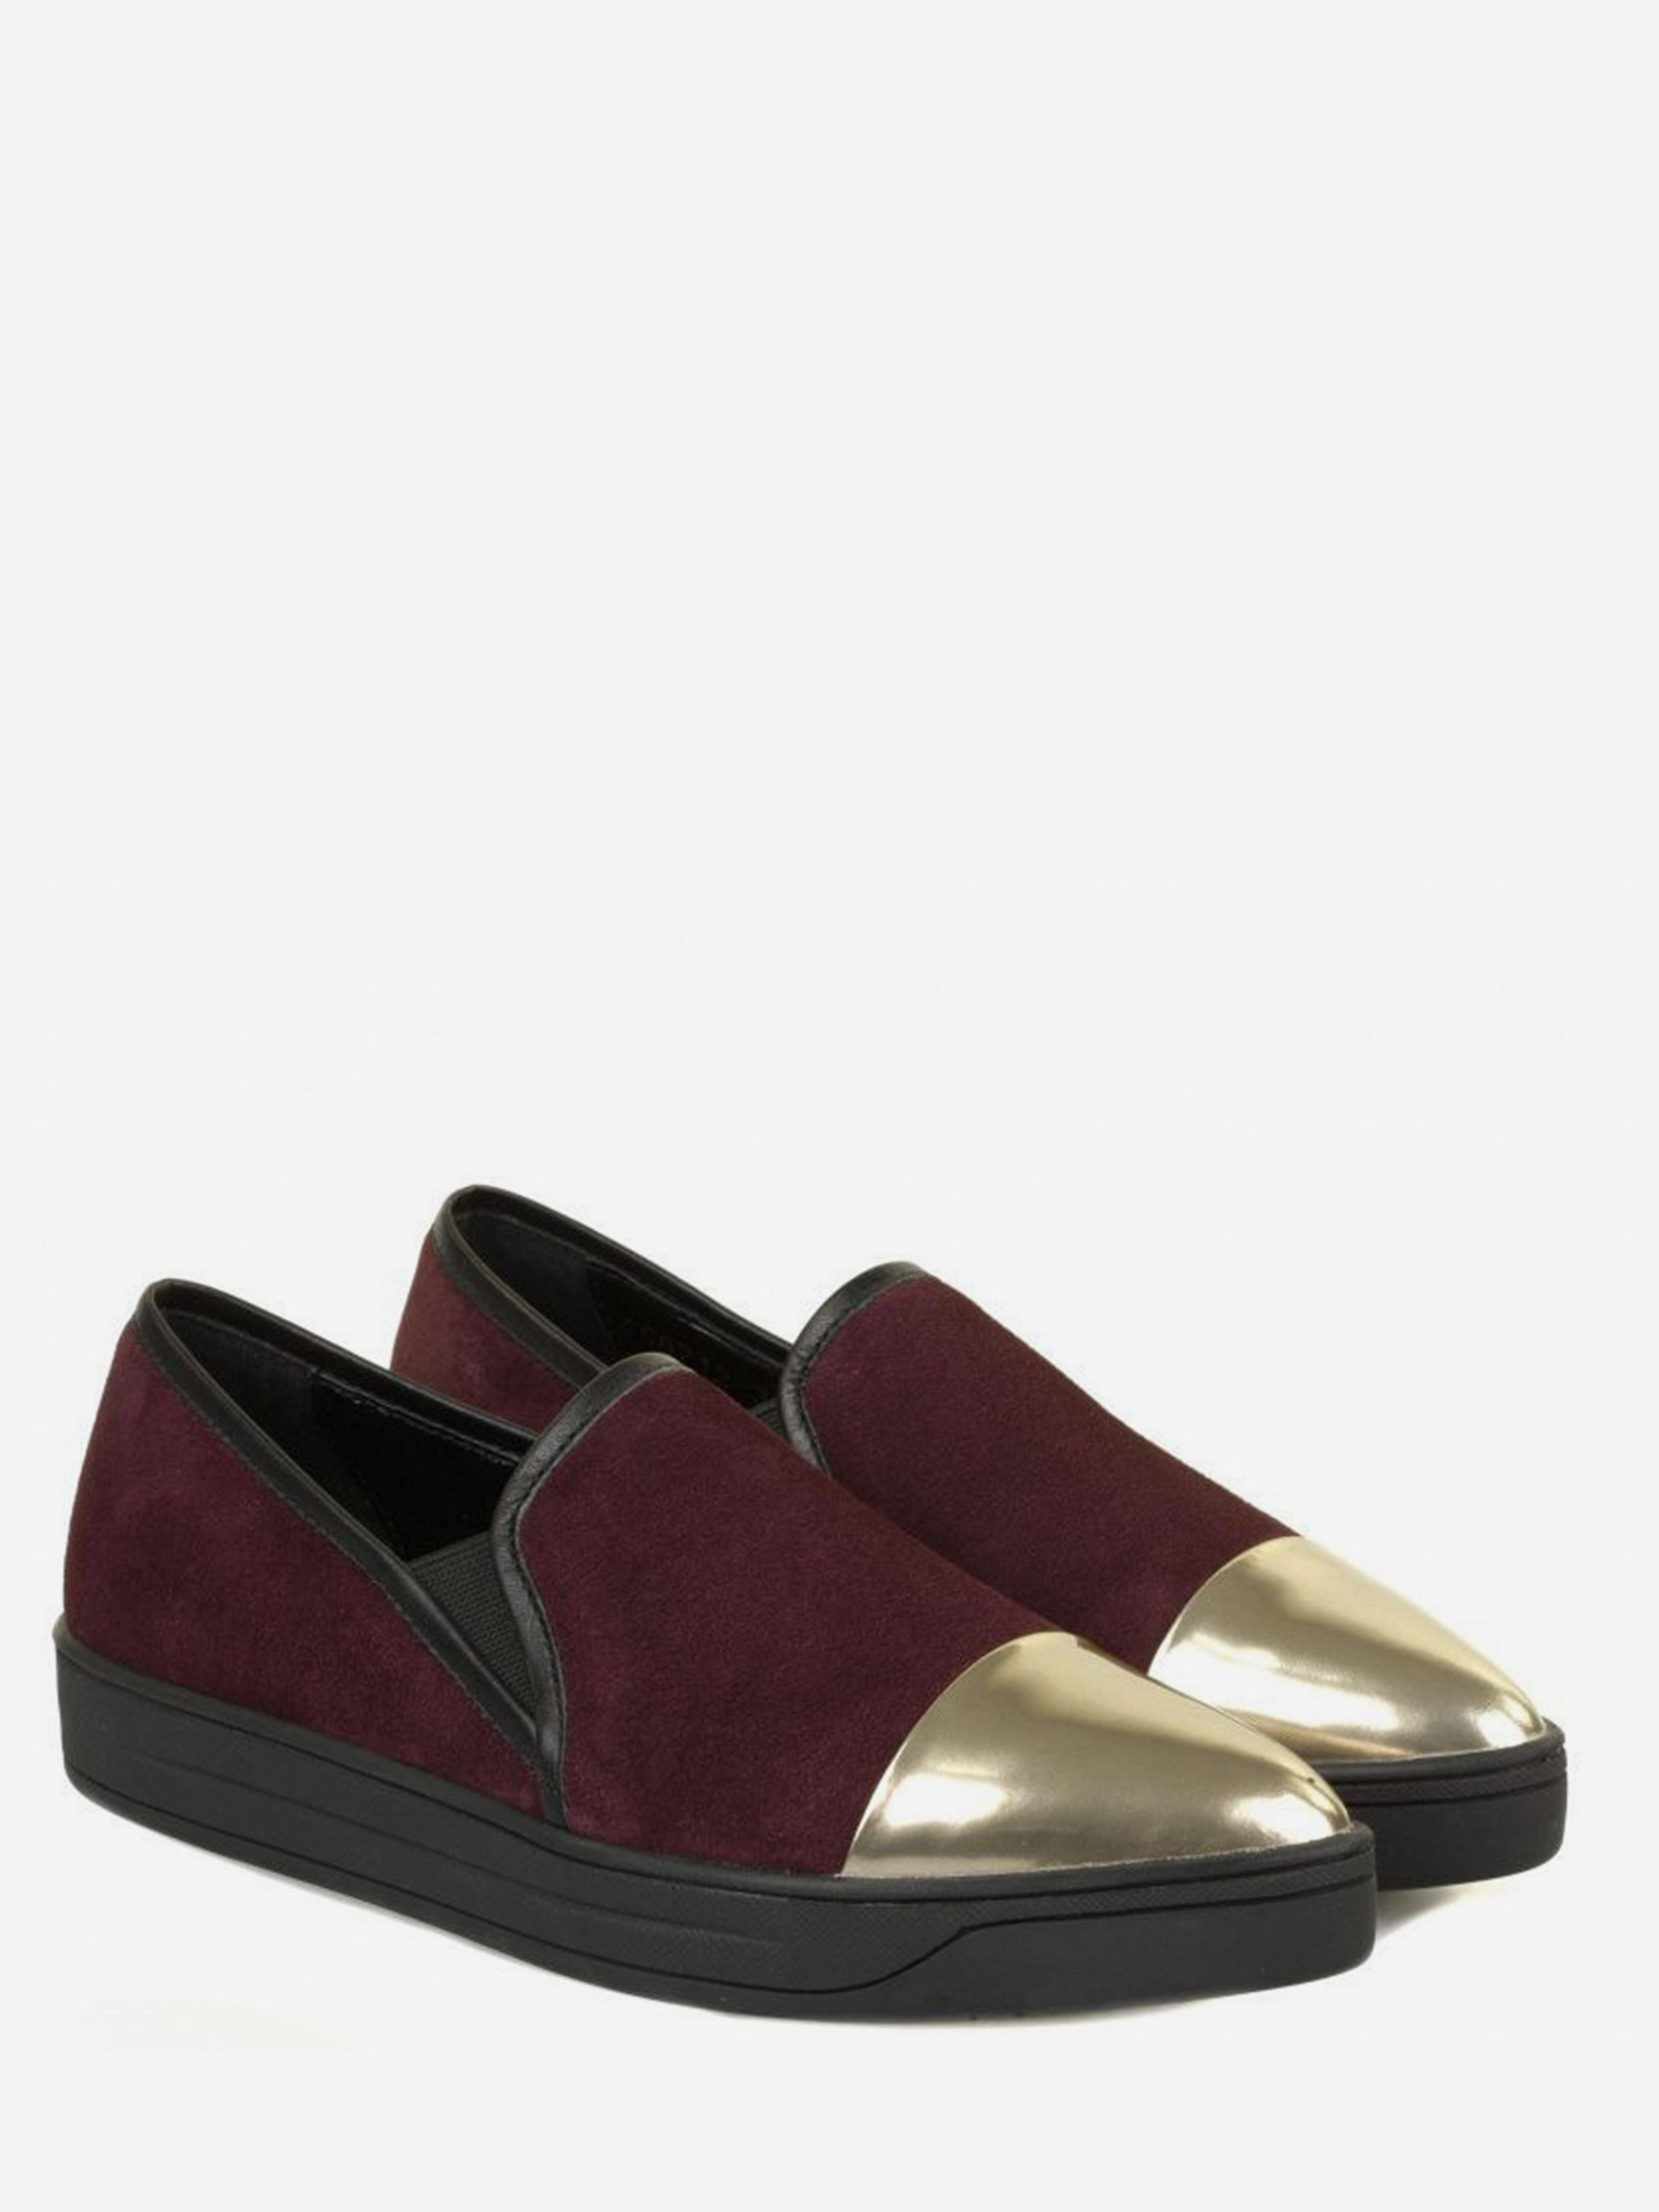 Туфли для женщин Braska QL33 цена, 2017